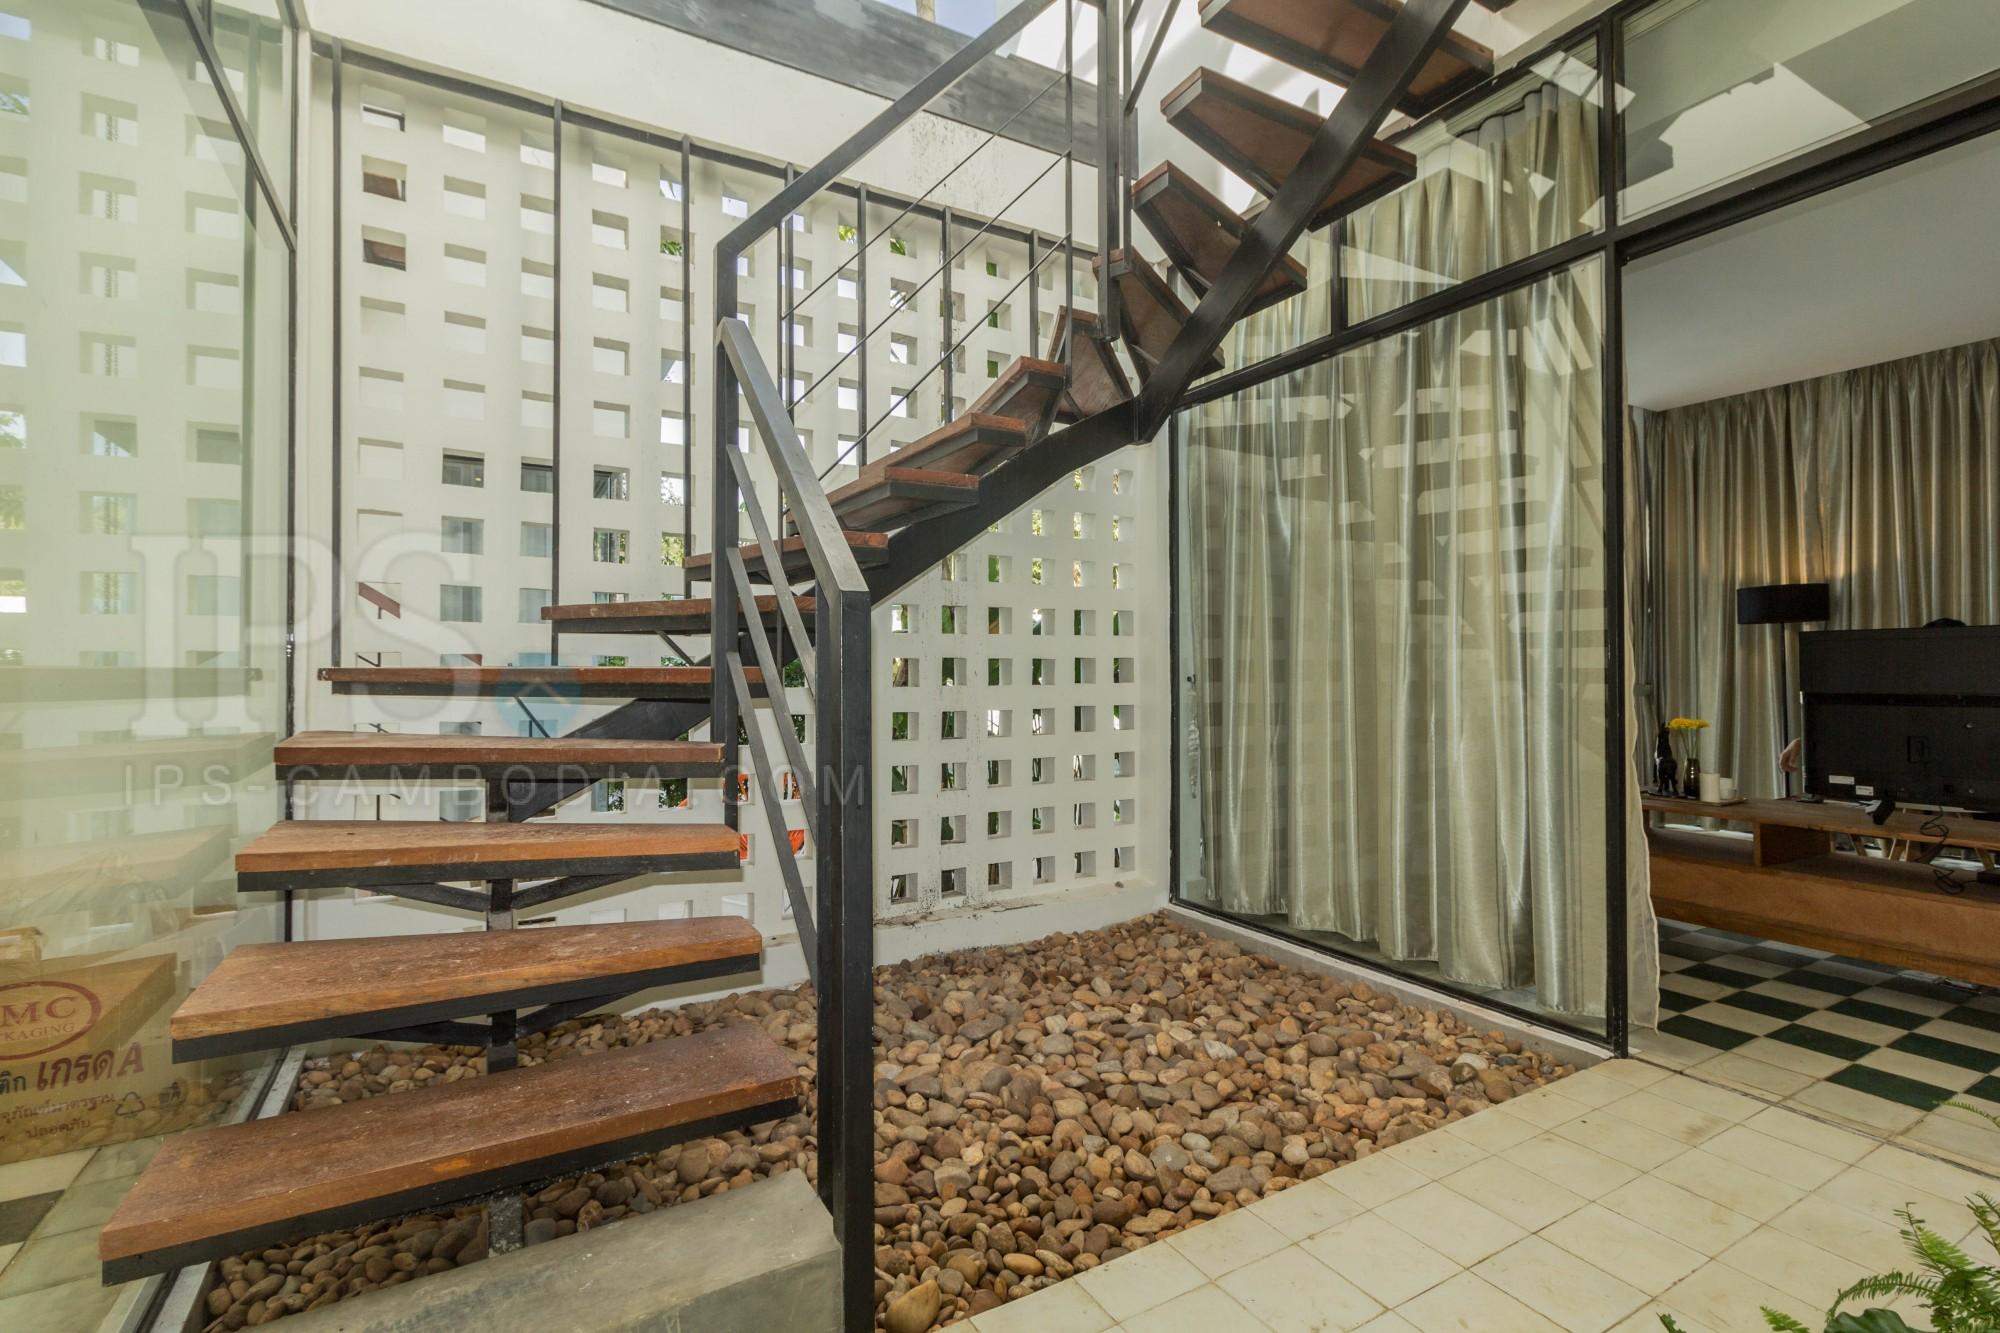 2 Bedroom Apartment For Rent - Kouk Chak, Siem Reap